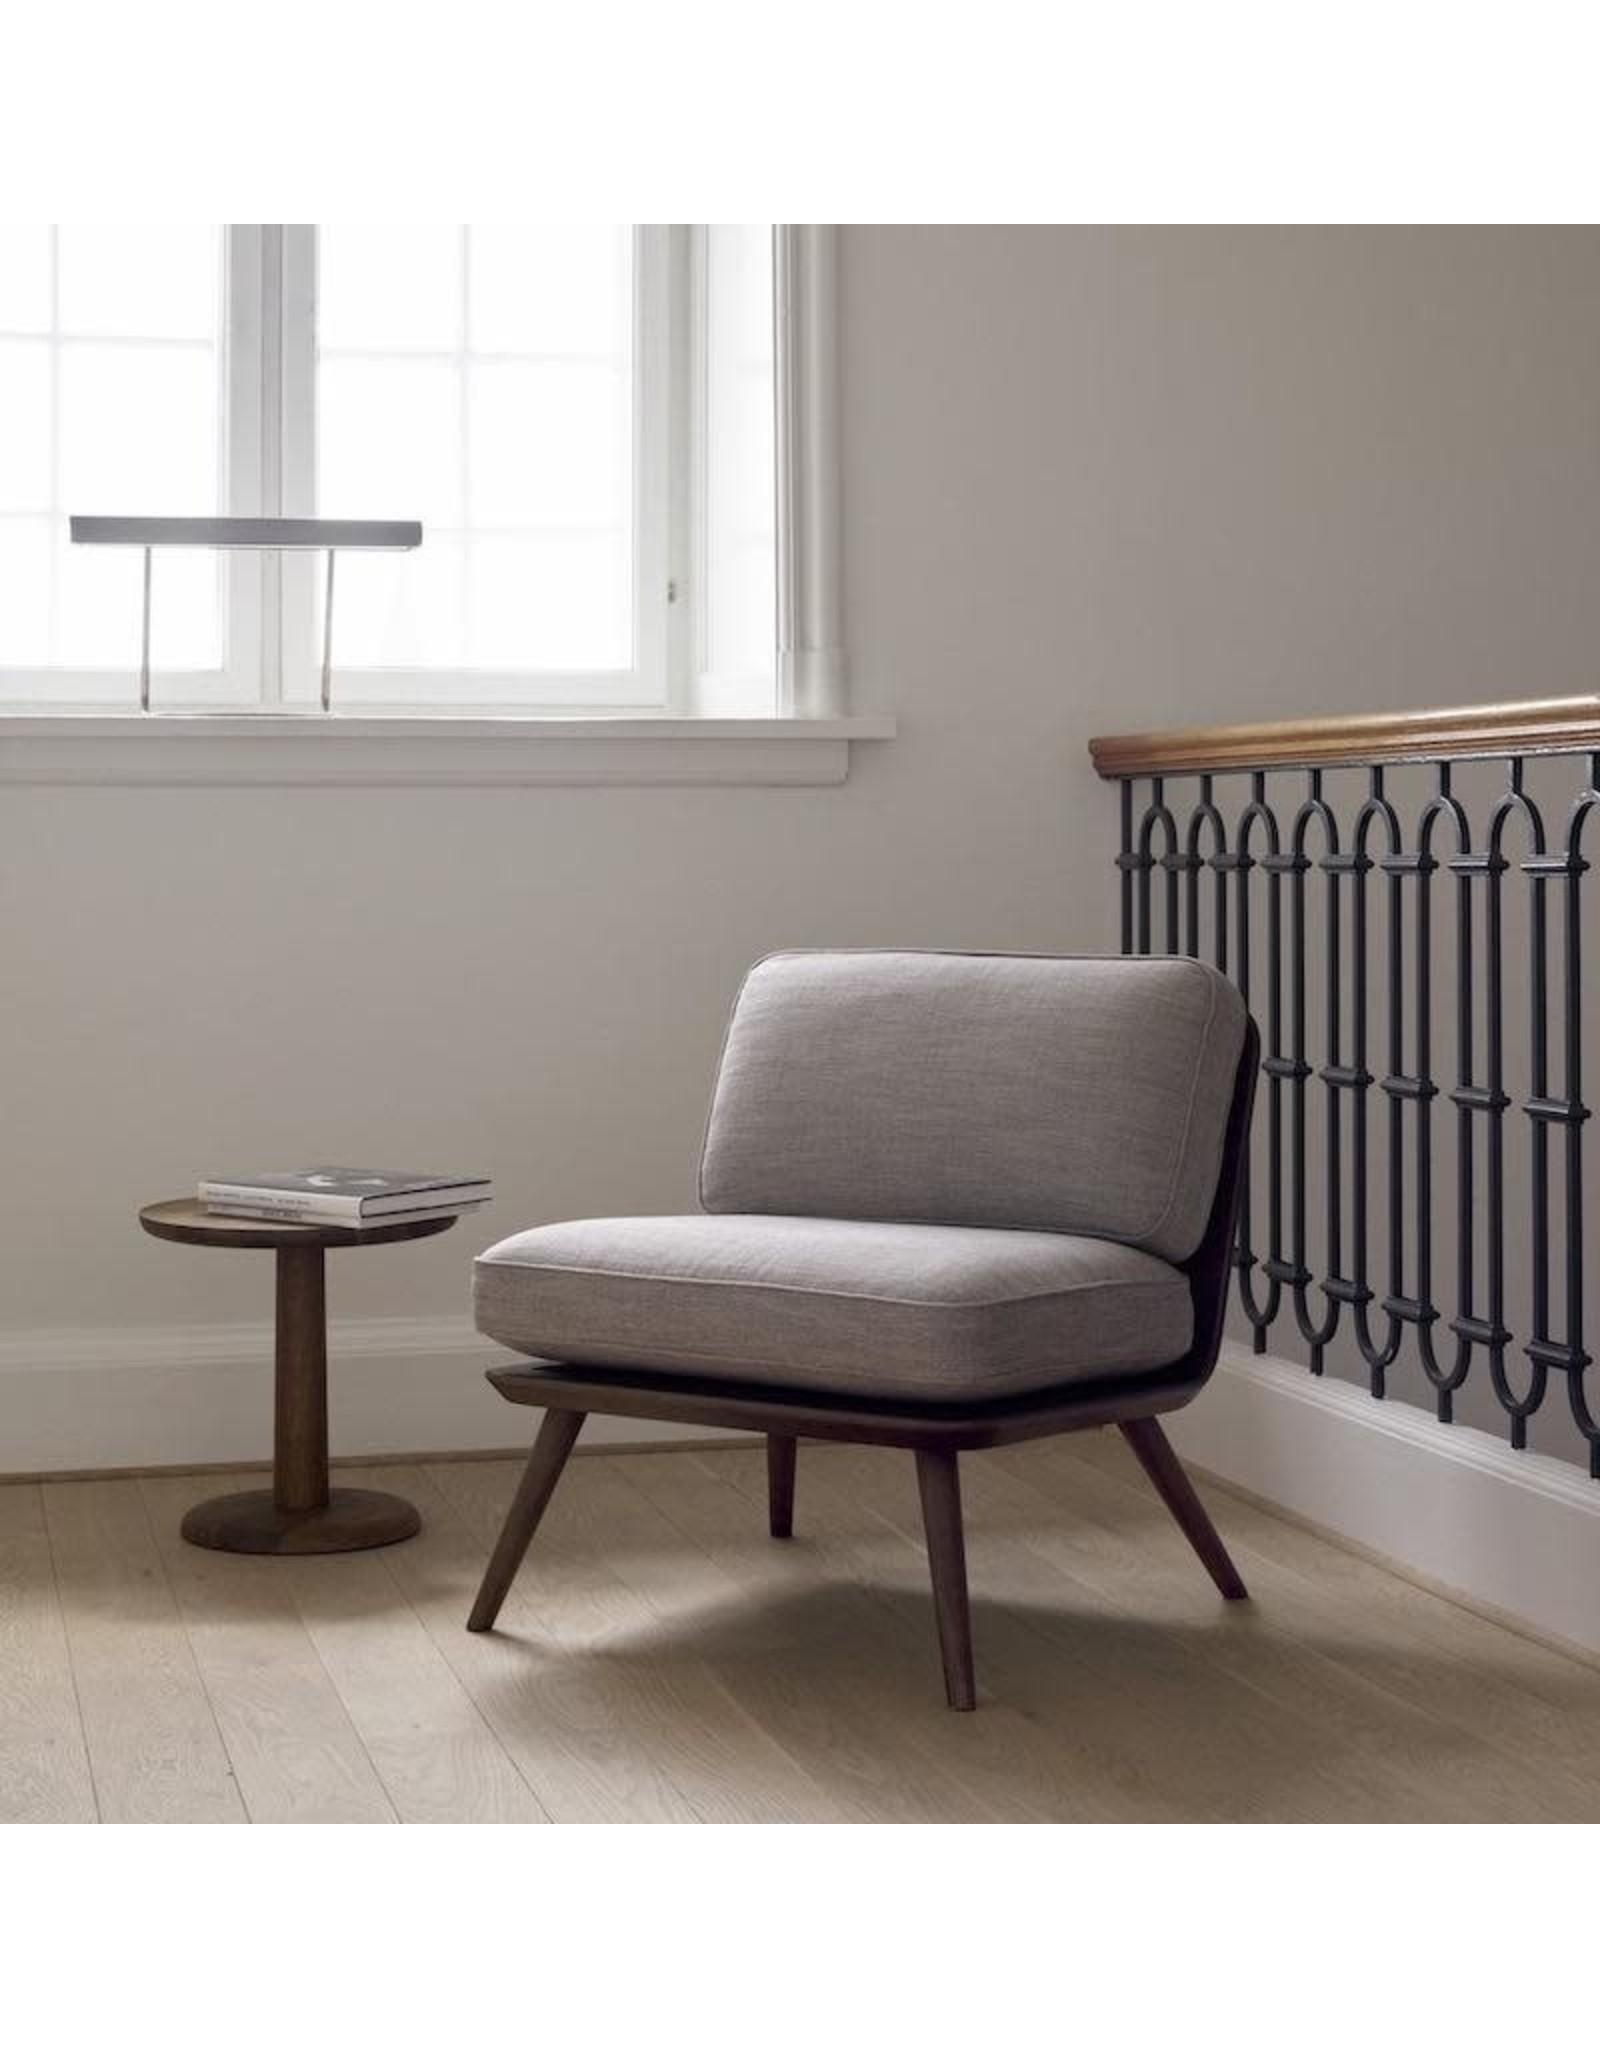 1711 SPINE 小型休閒椅